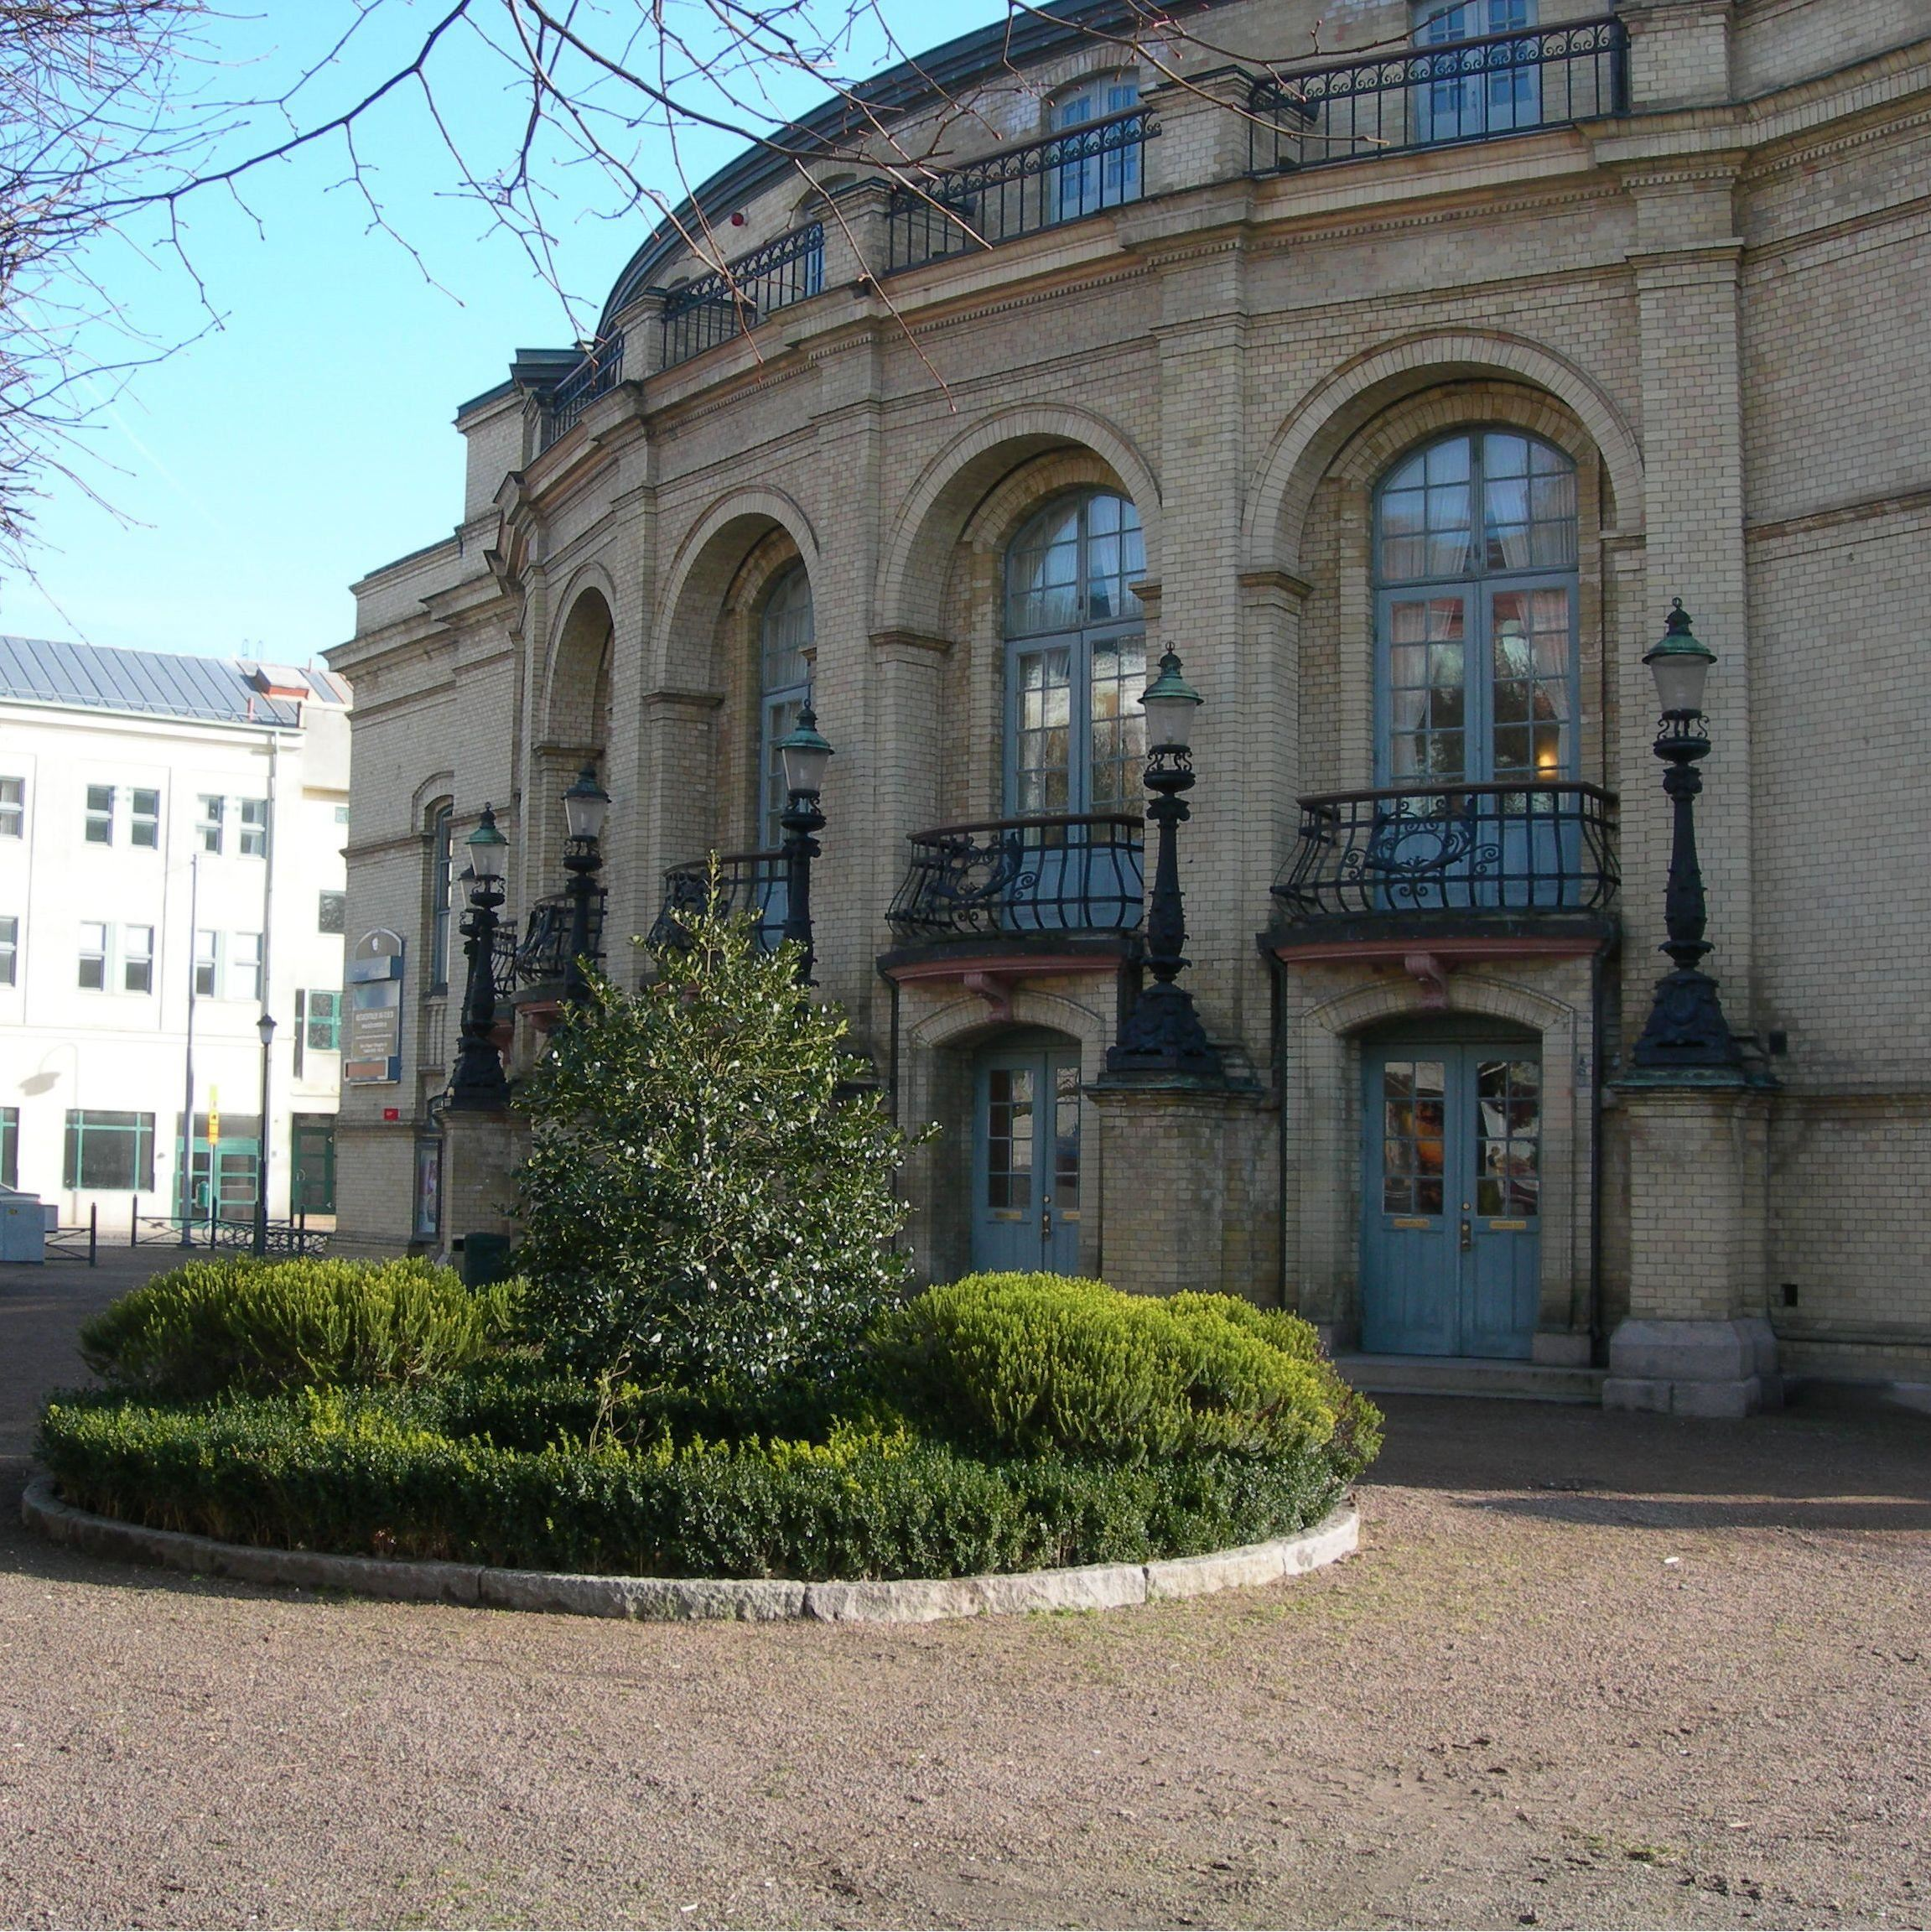 The Landskrona Theatre